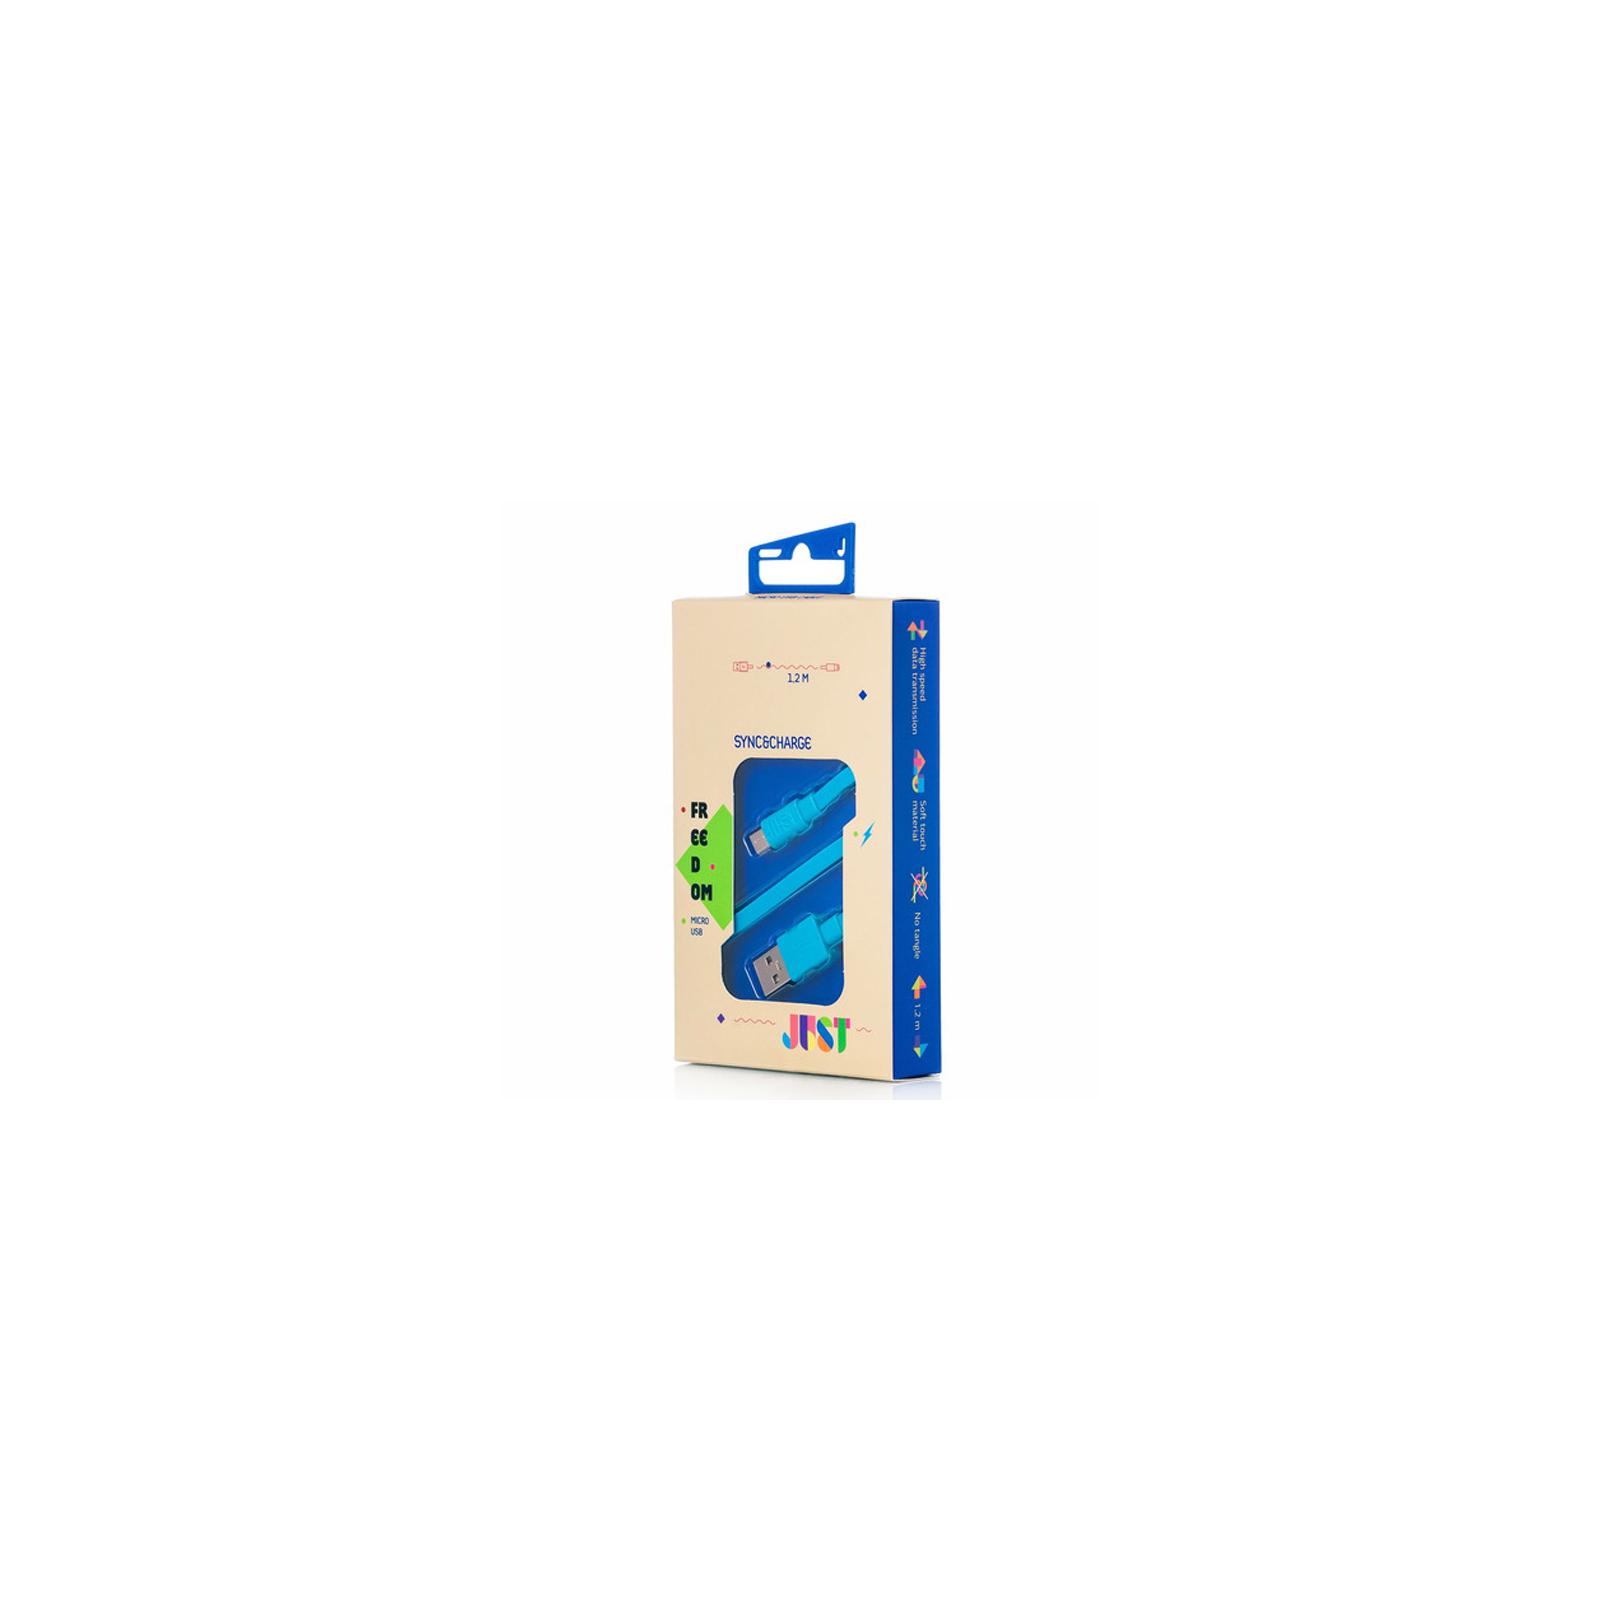 Дата кабель JUST Freedom Micro USB Cable Blue (MCR-FRDM-BL) изображение 3